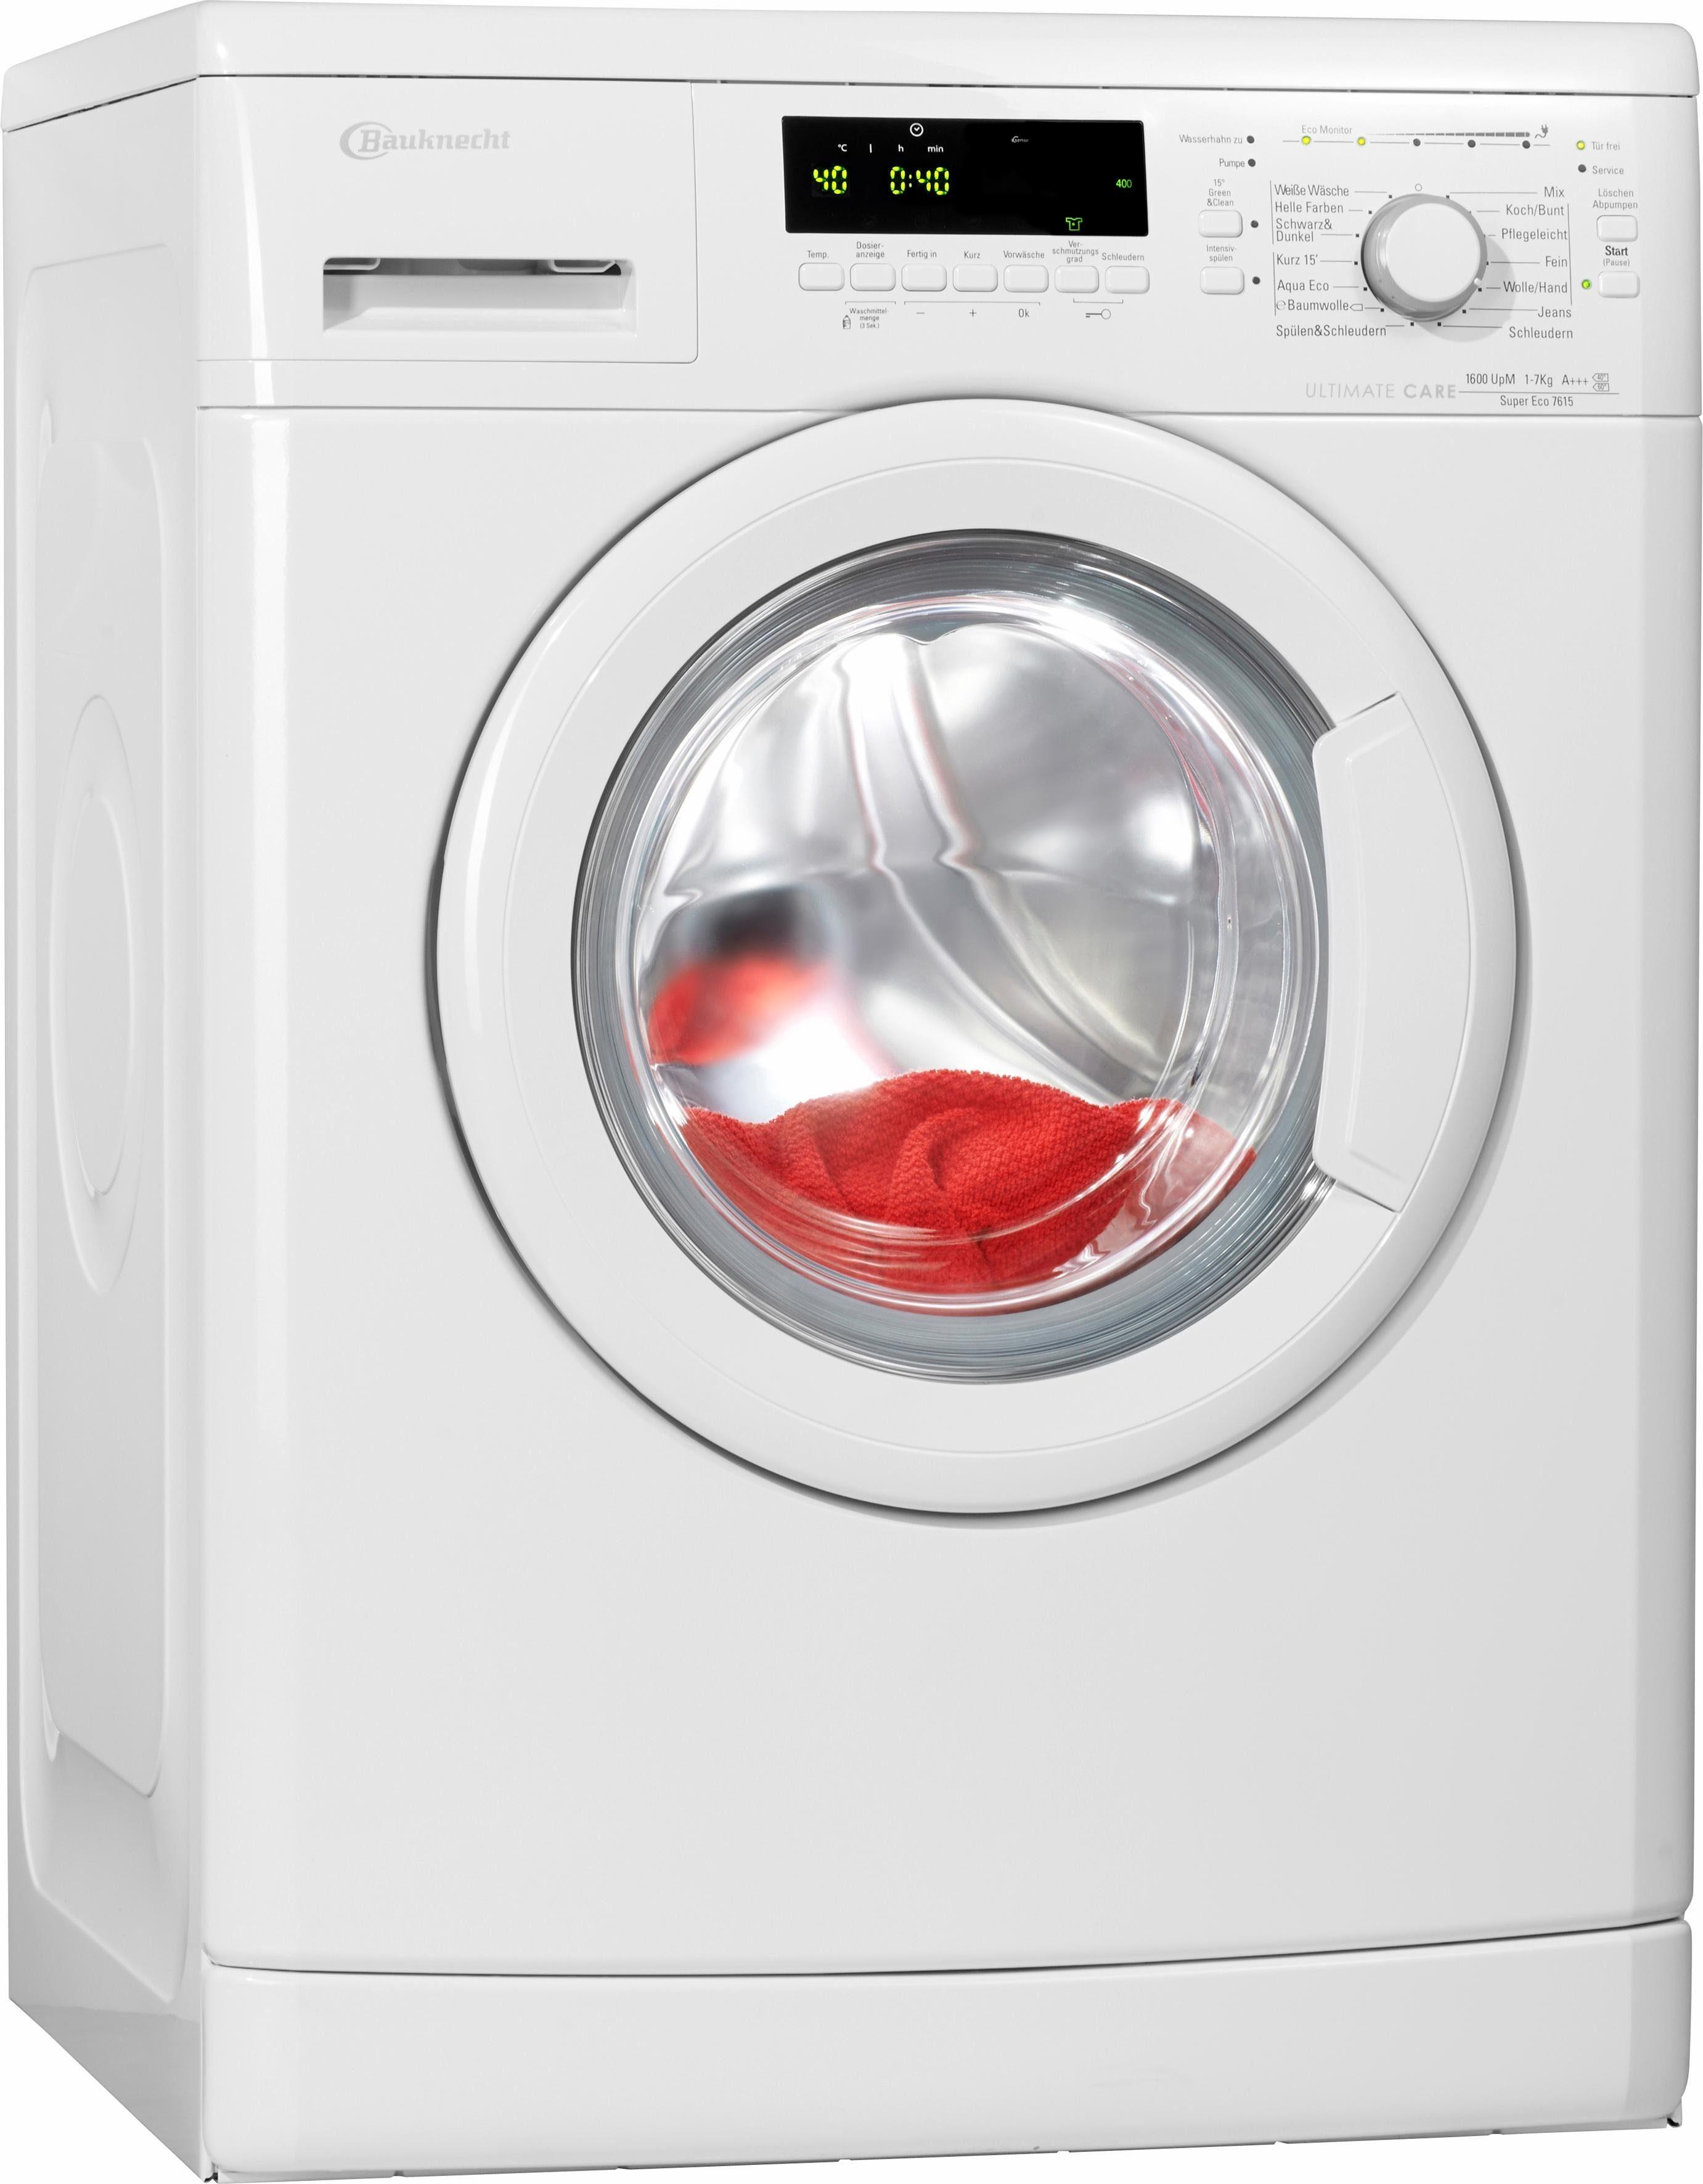 BAUKNECHT Waschmaschine Super Eco 7615, 7 kg, 1600 U/Min